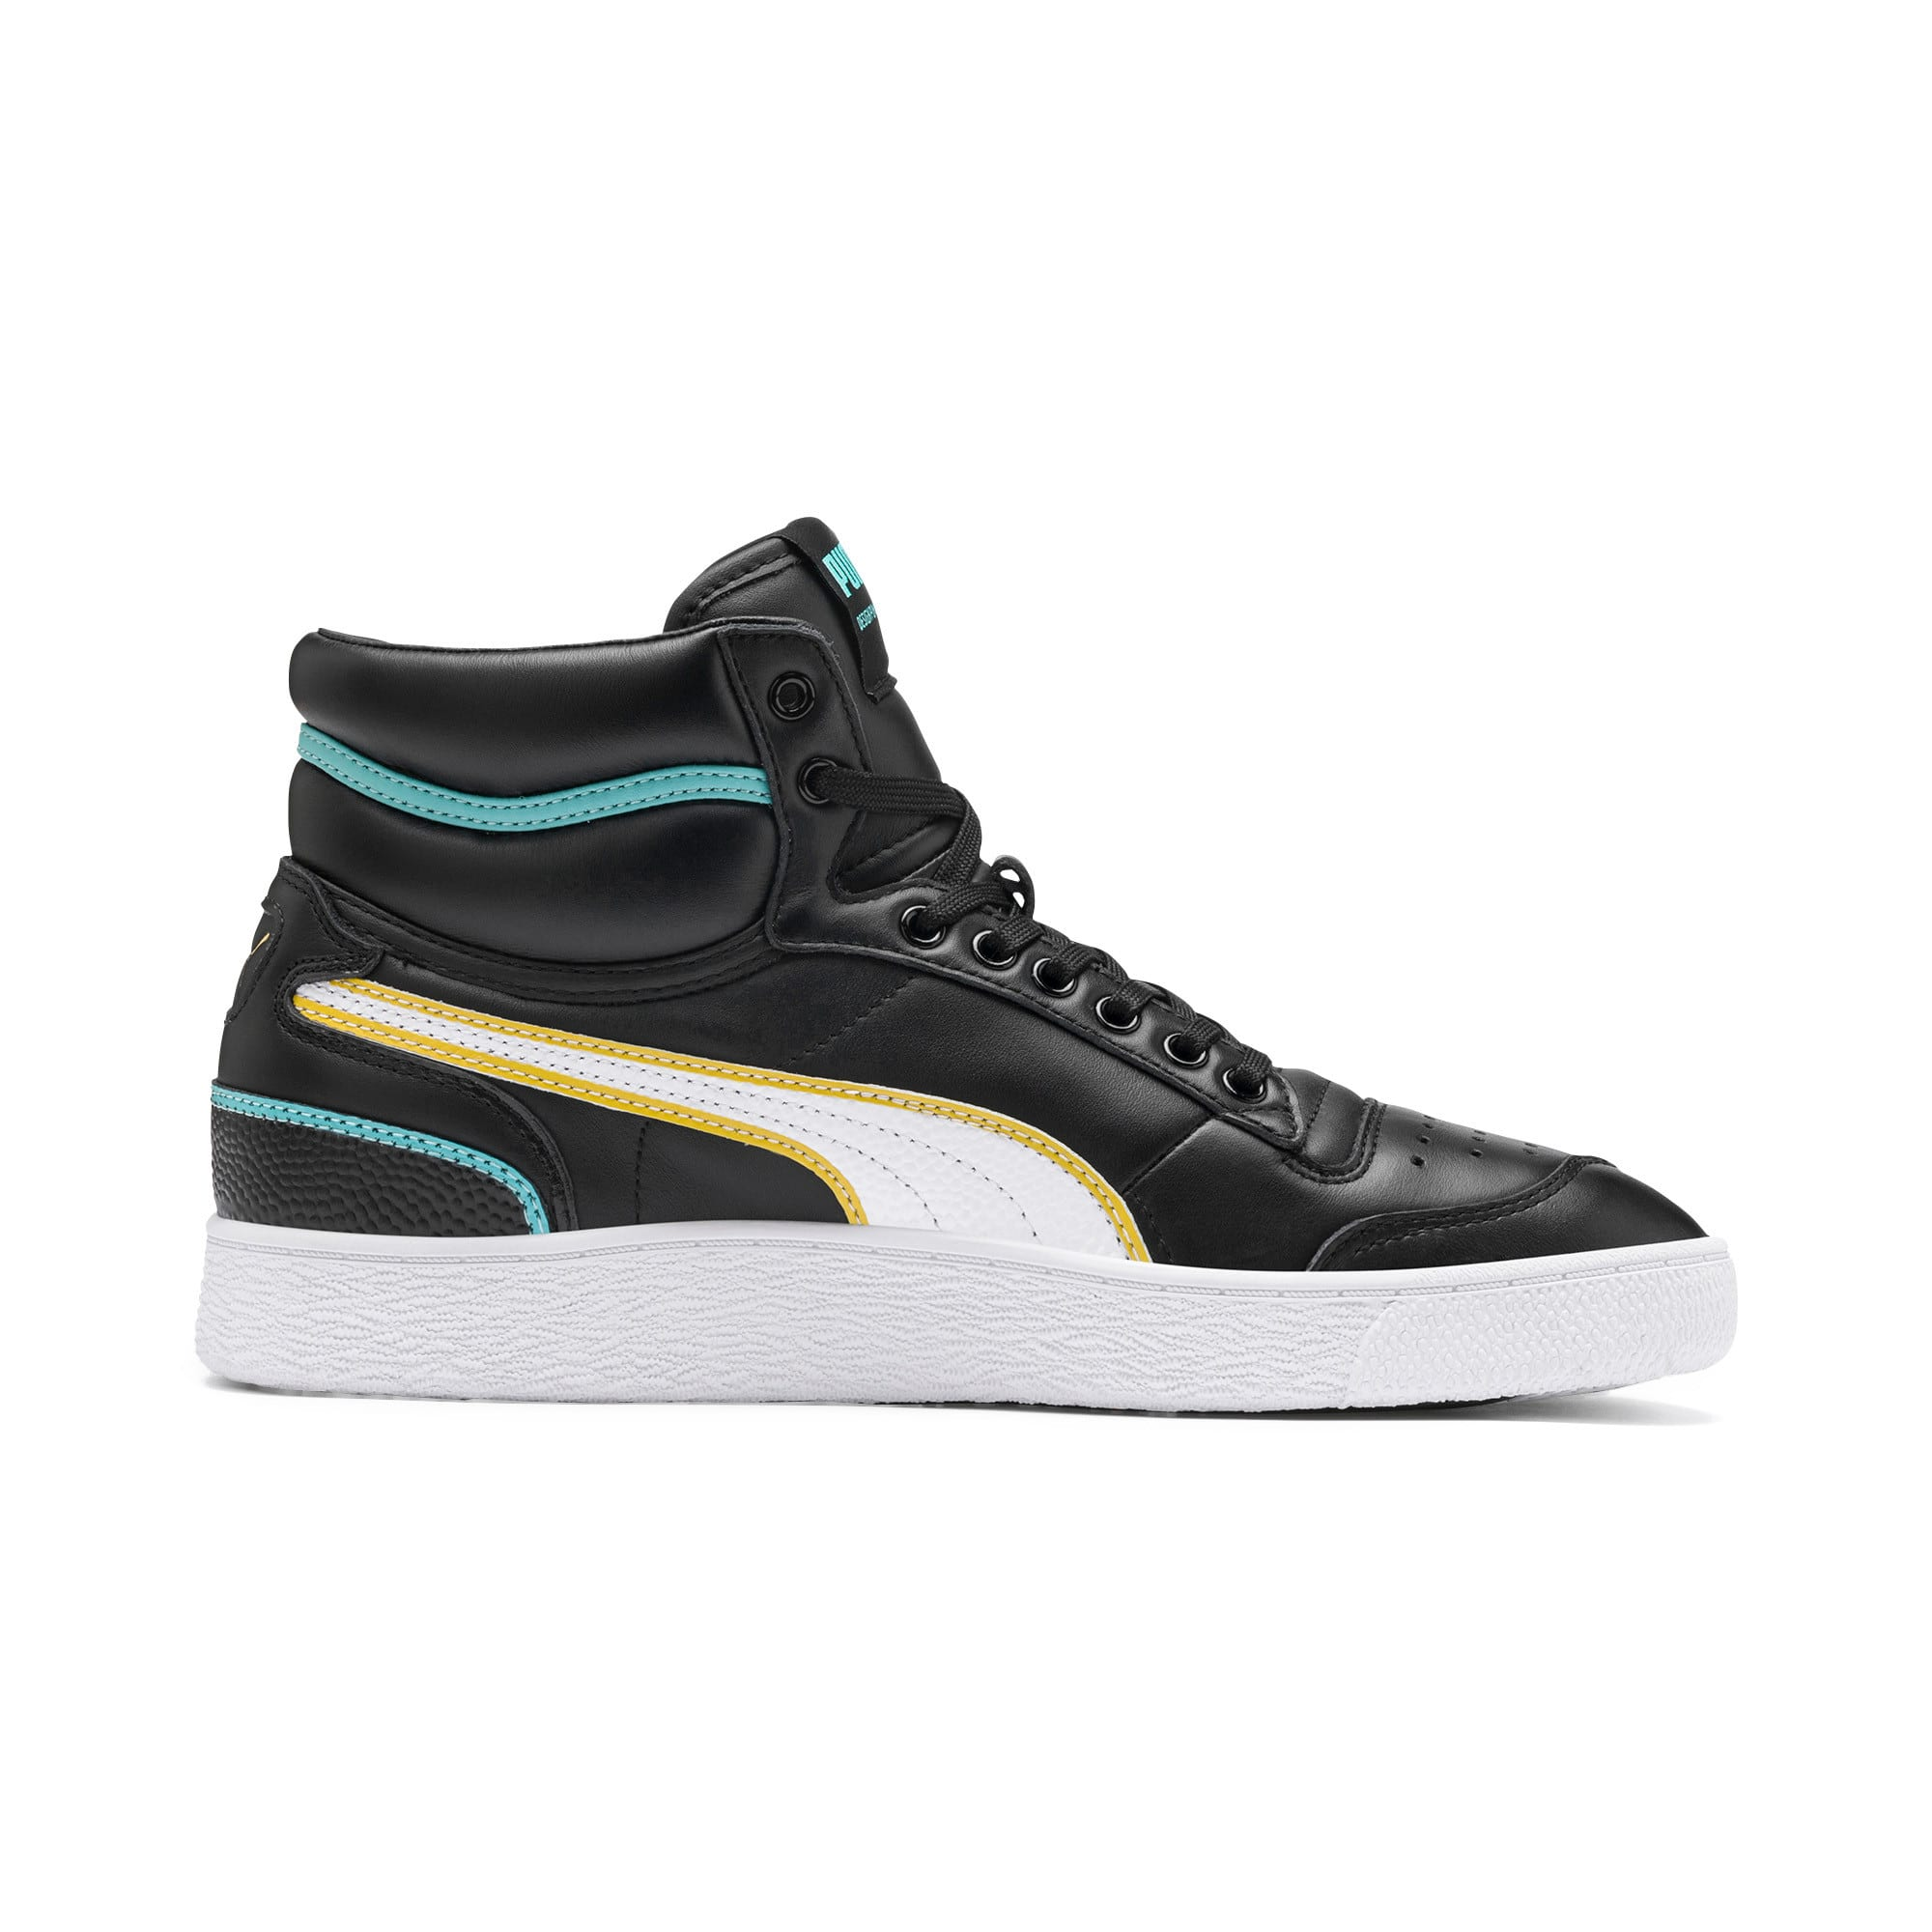 Miniatura 6 de Zapatos deportivos de caña media Ralph Sampson Hoops, Puma Blk-Puma Wht-Puma Wht, mediano